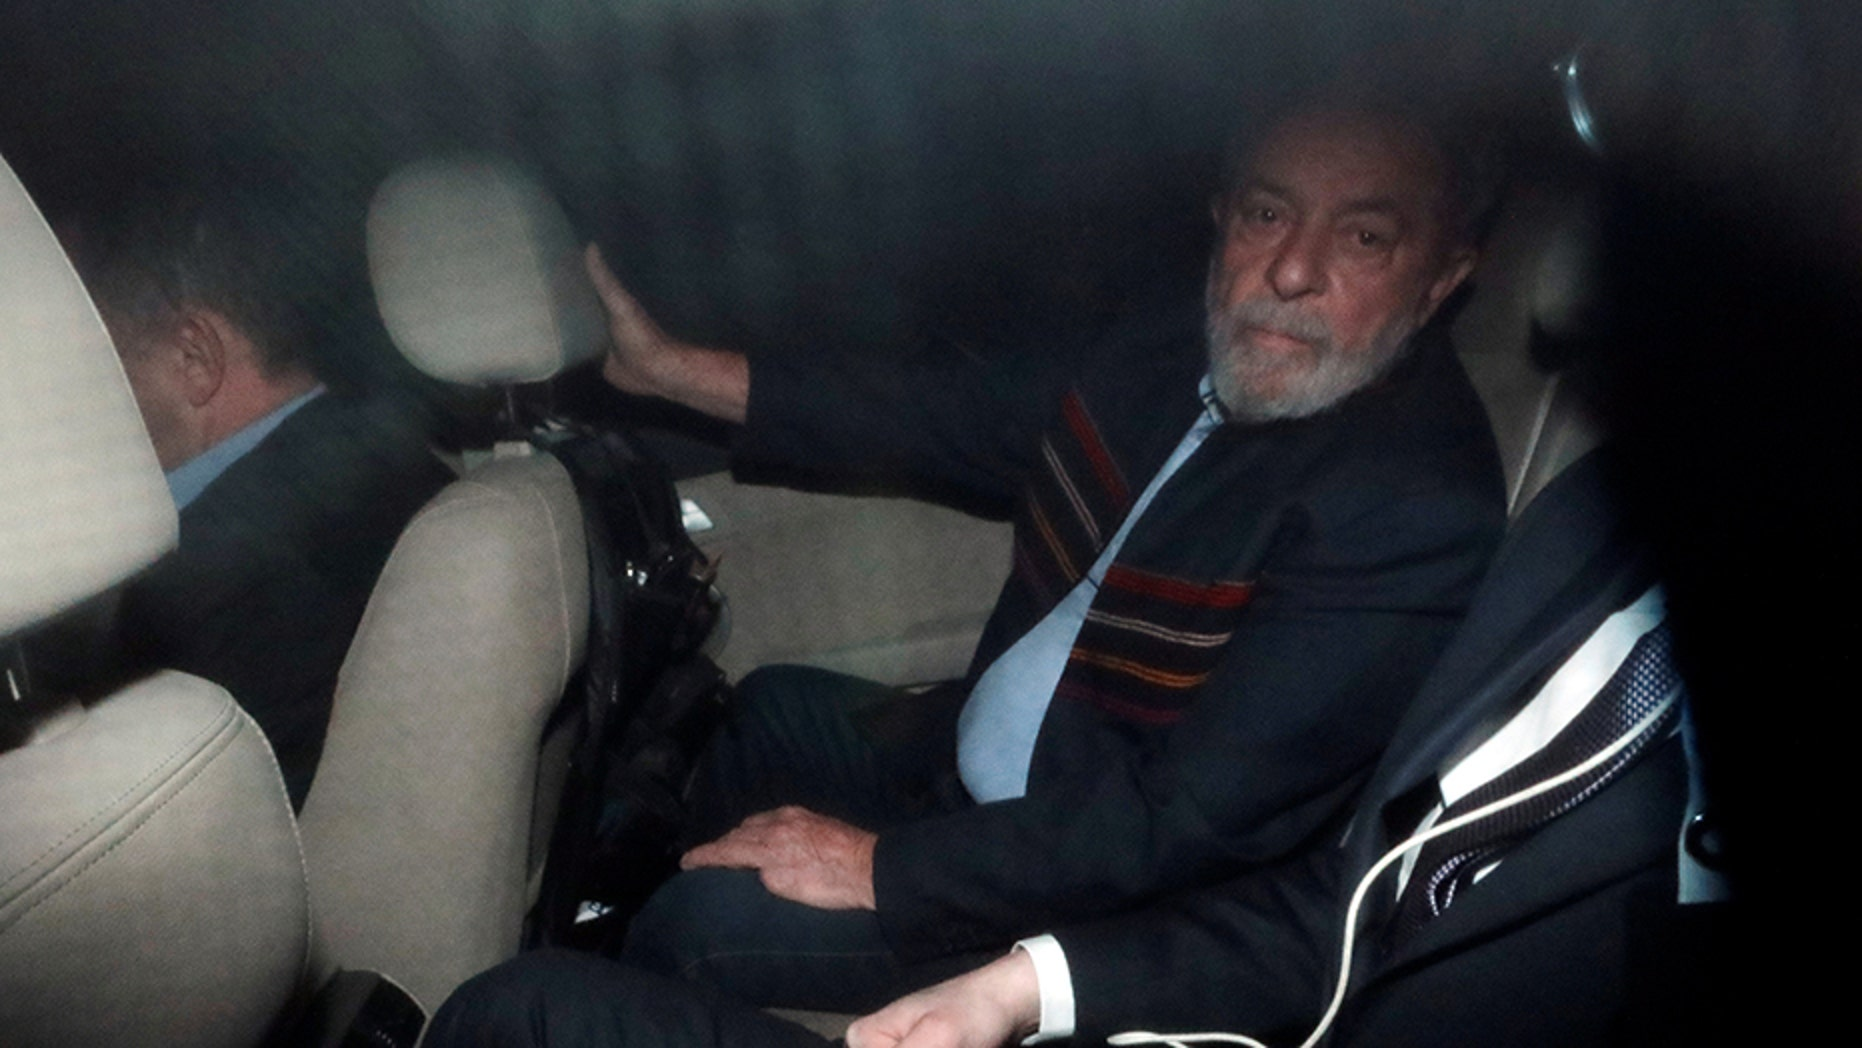 Former Brazilian President Luiz Inacio Lula da Silva, seen inside a car in Sao Paulo on Thursday, faced an arrest warrant.